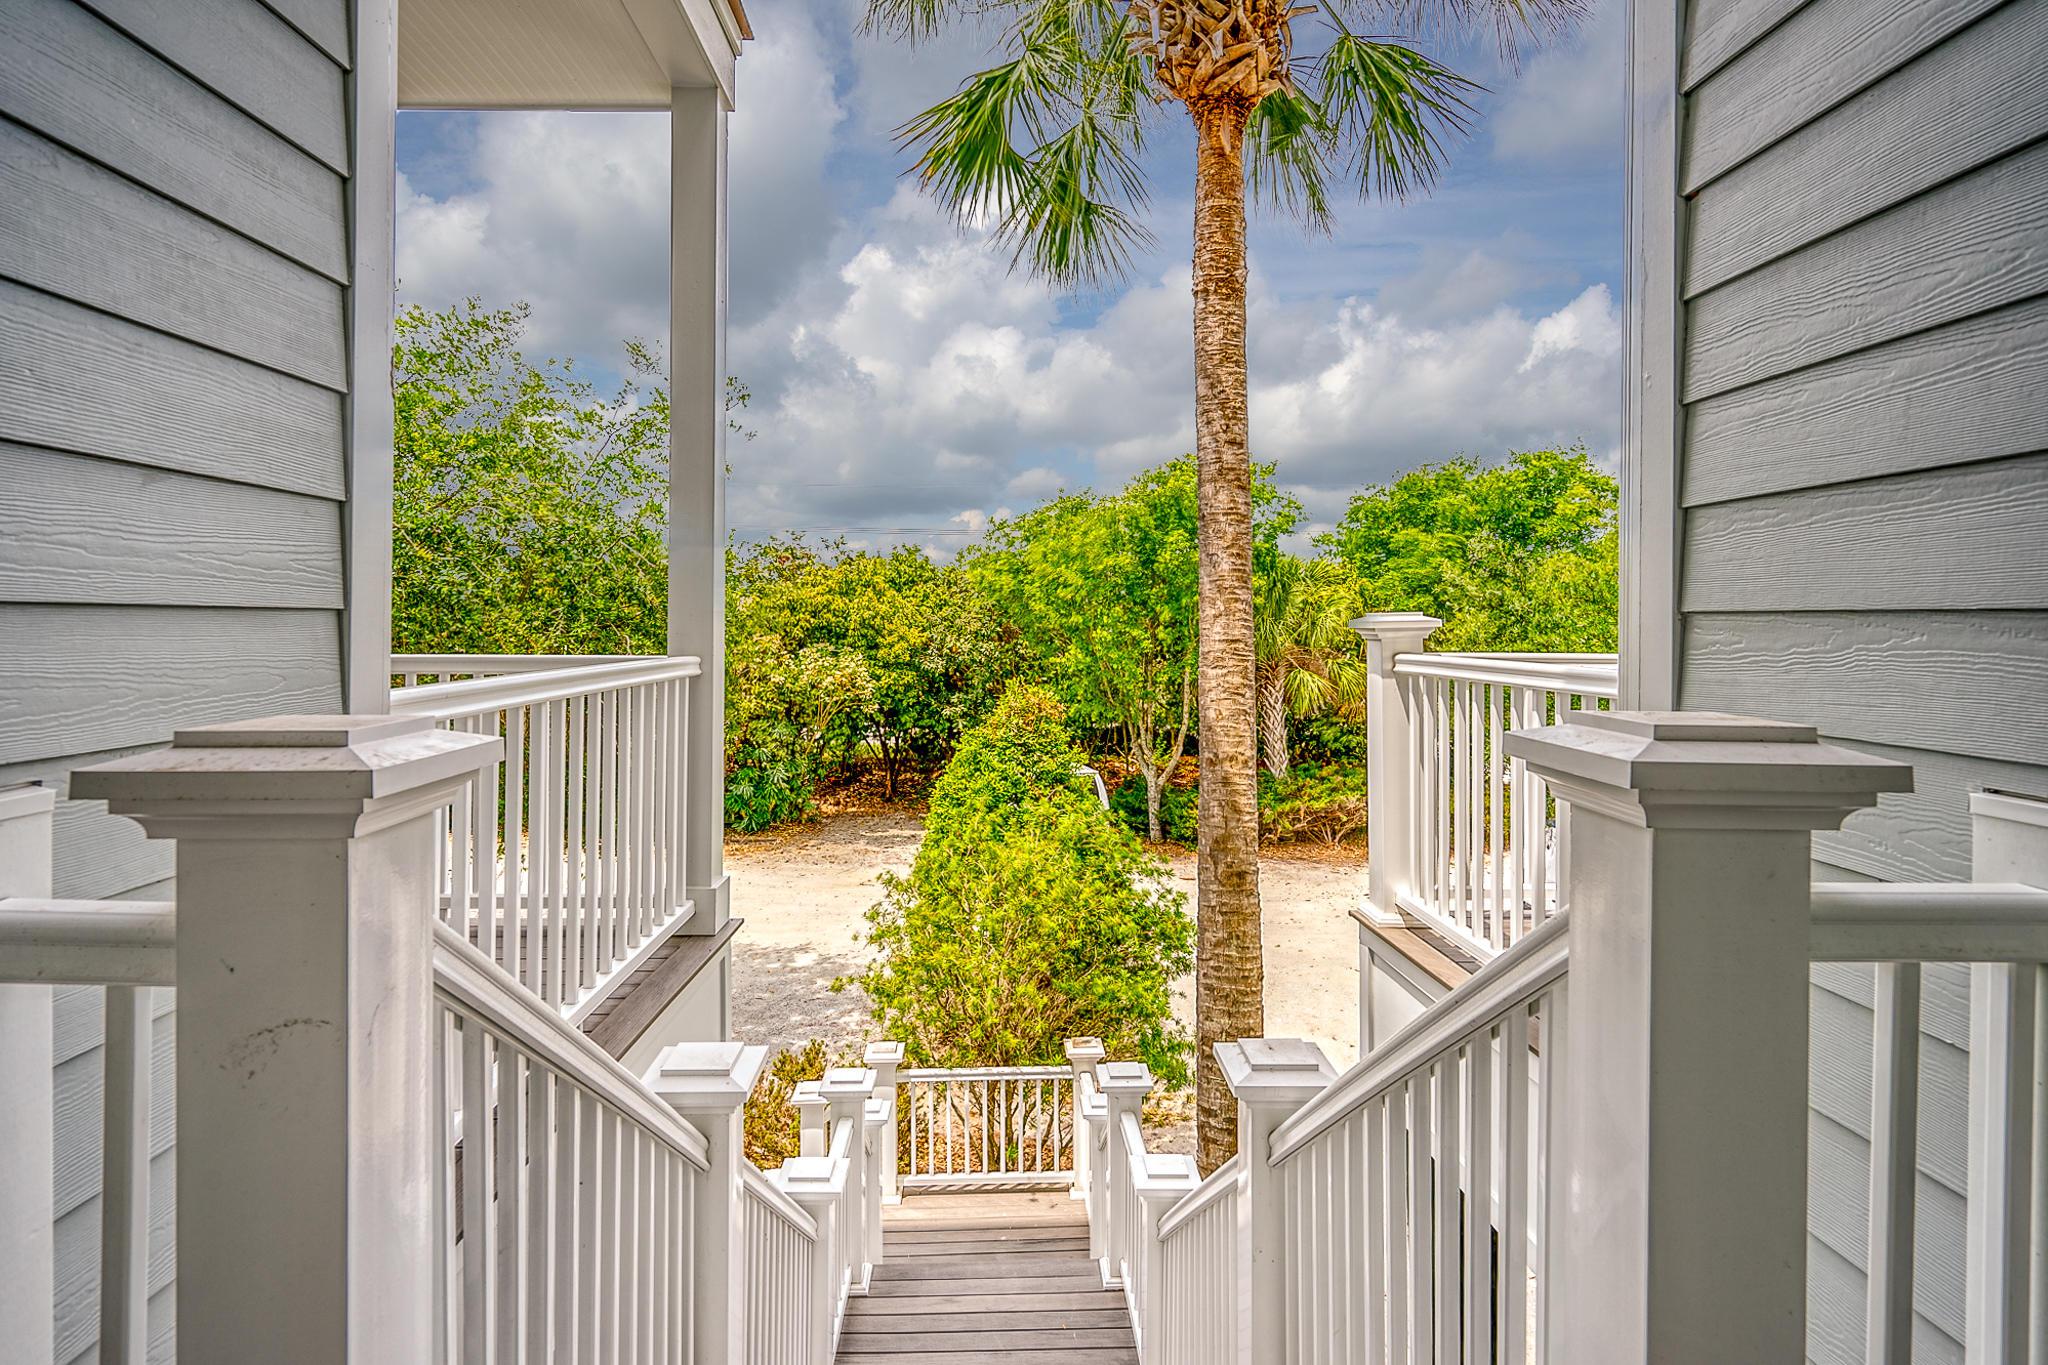 Folly Creek Place Homes For Sale - 2238 Folly Road, Folly Beach, SC - 30